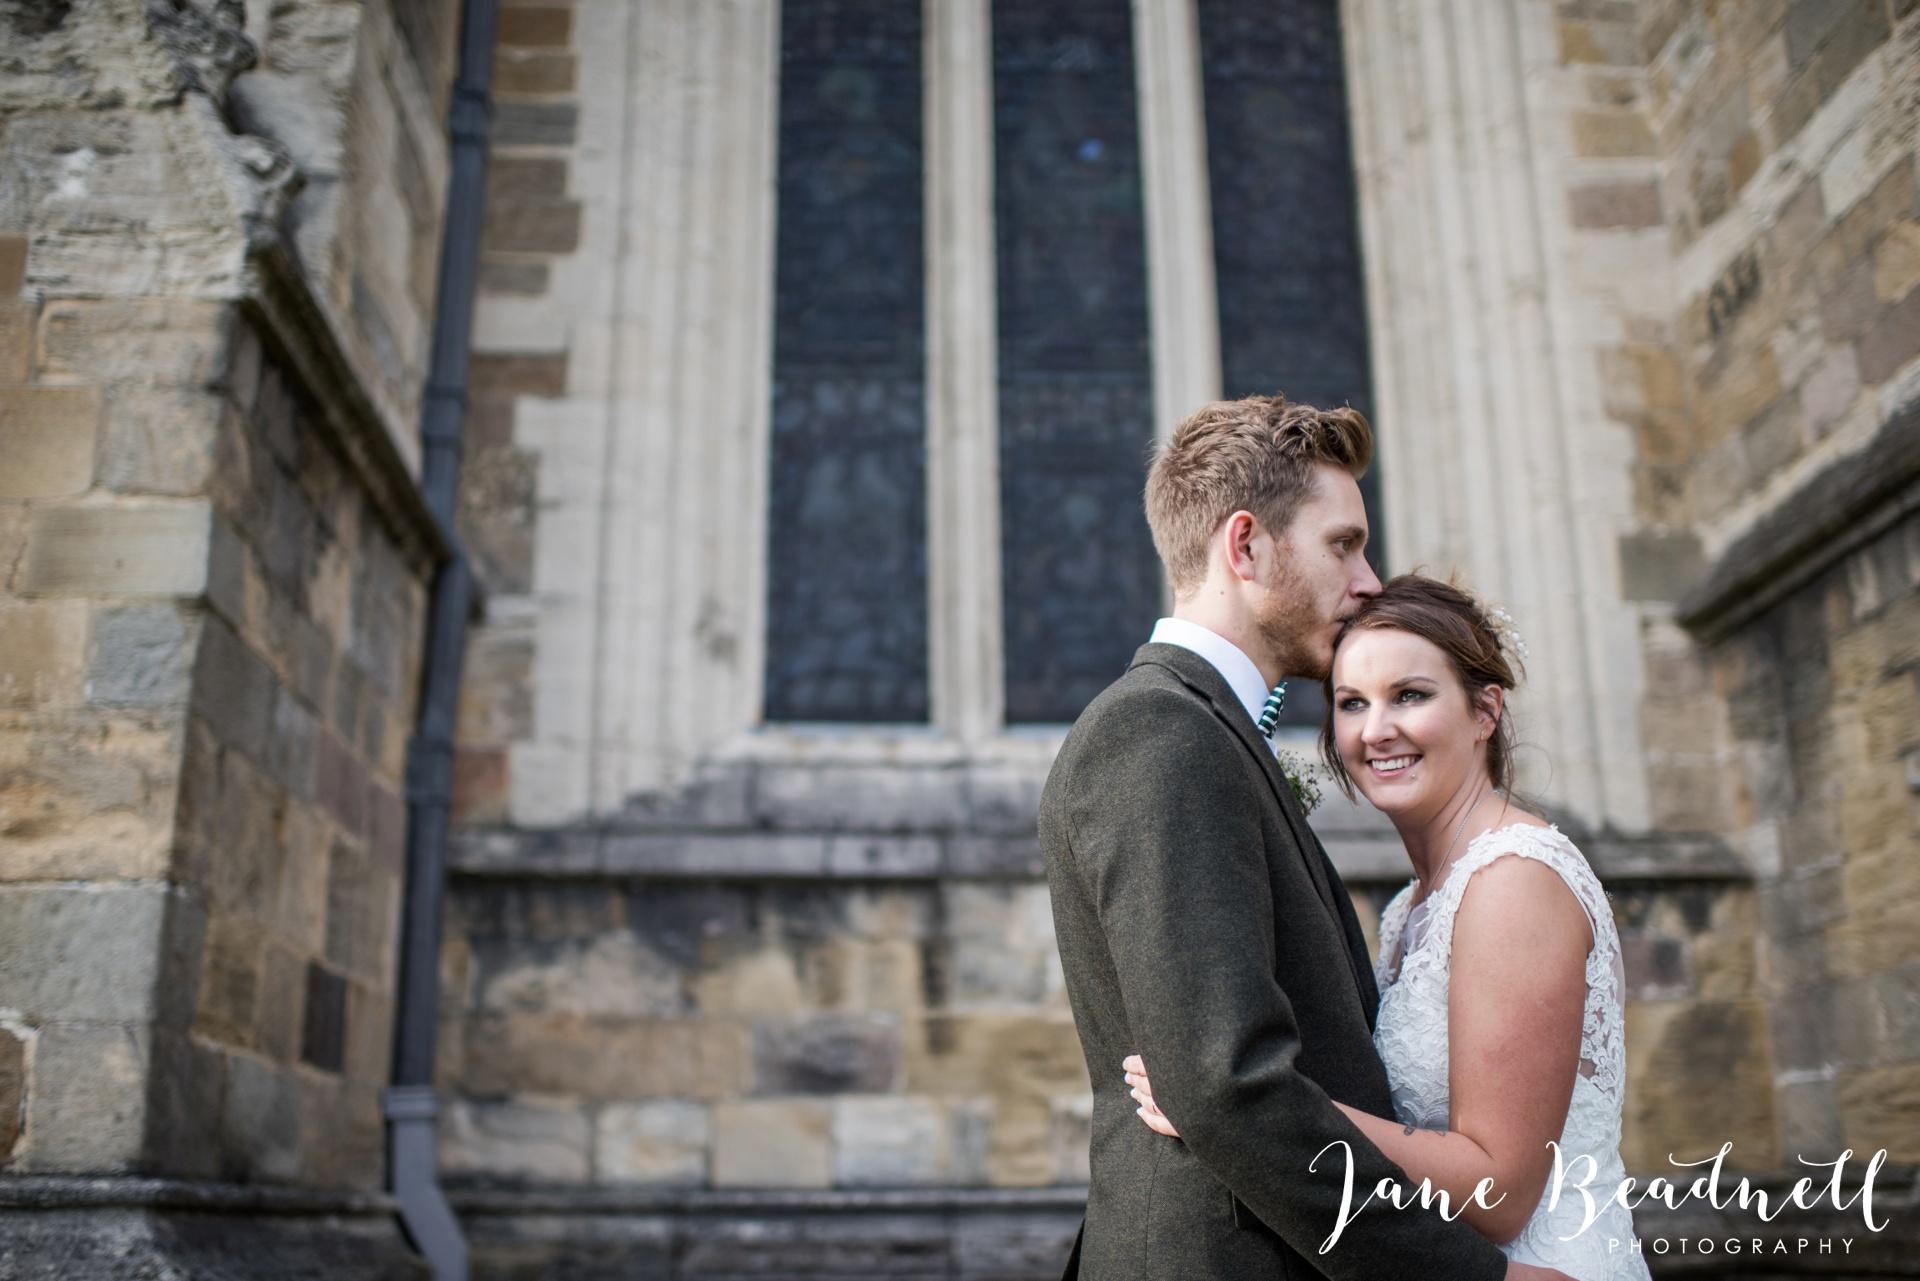 Jane Beadnell fine art wedding photographer The Old Deanery Ripon_0081